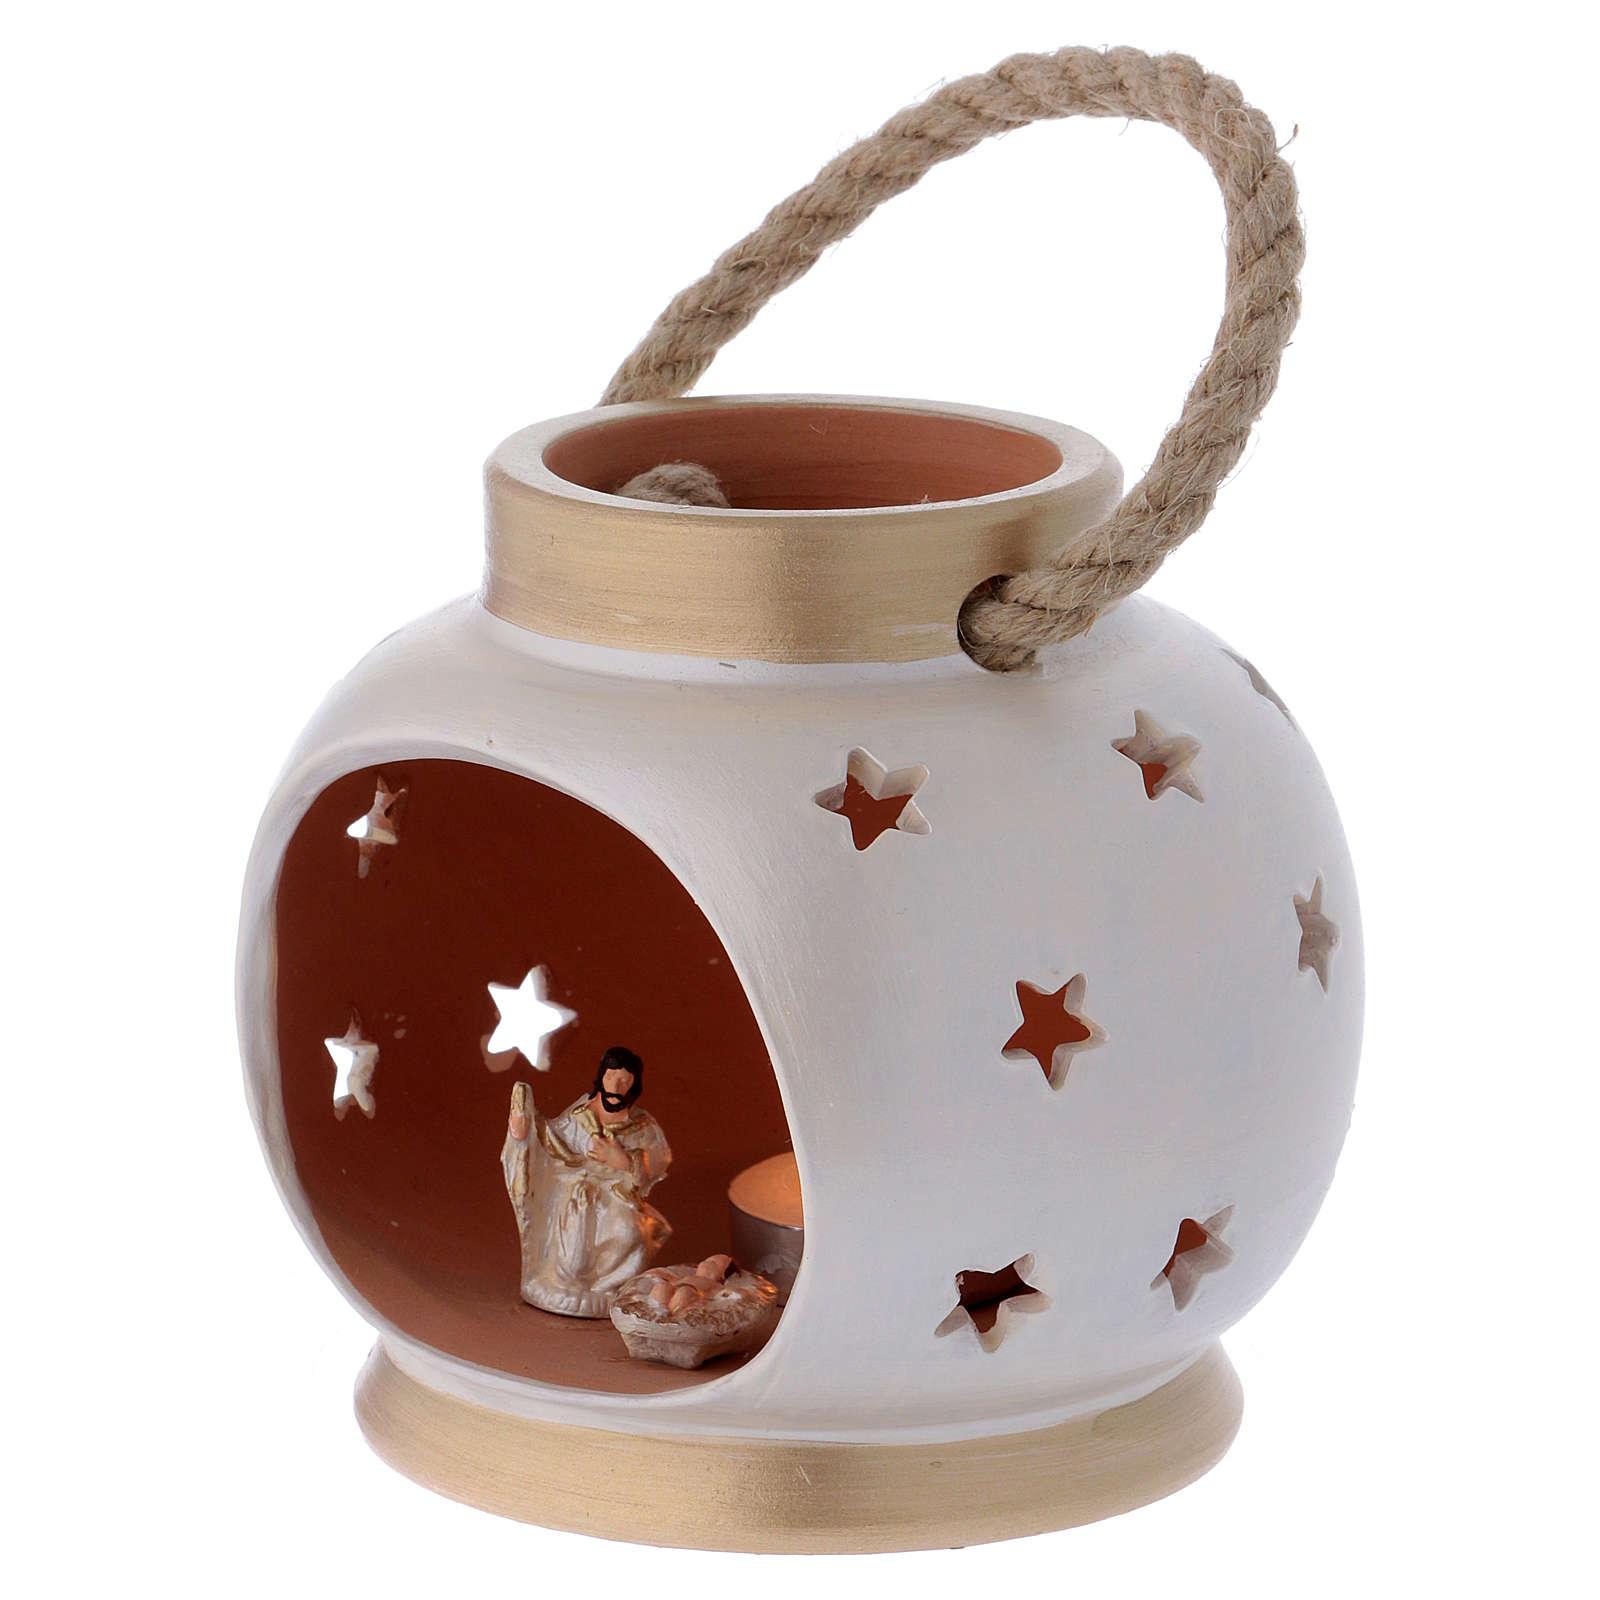 Portable oval lantern with Nativity in Deruta terracotta 4